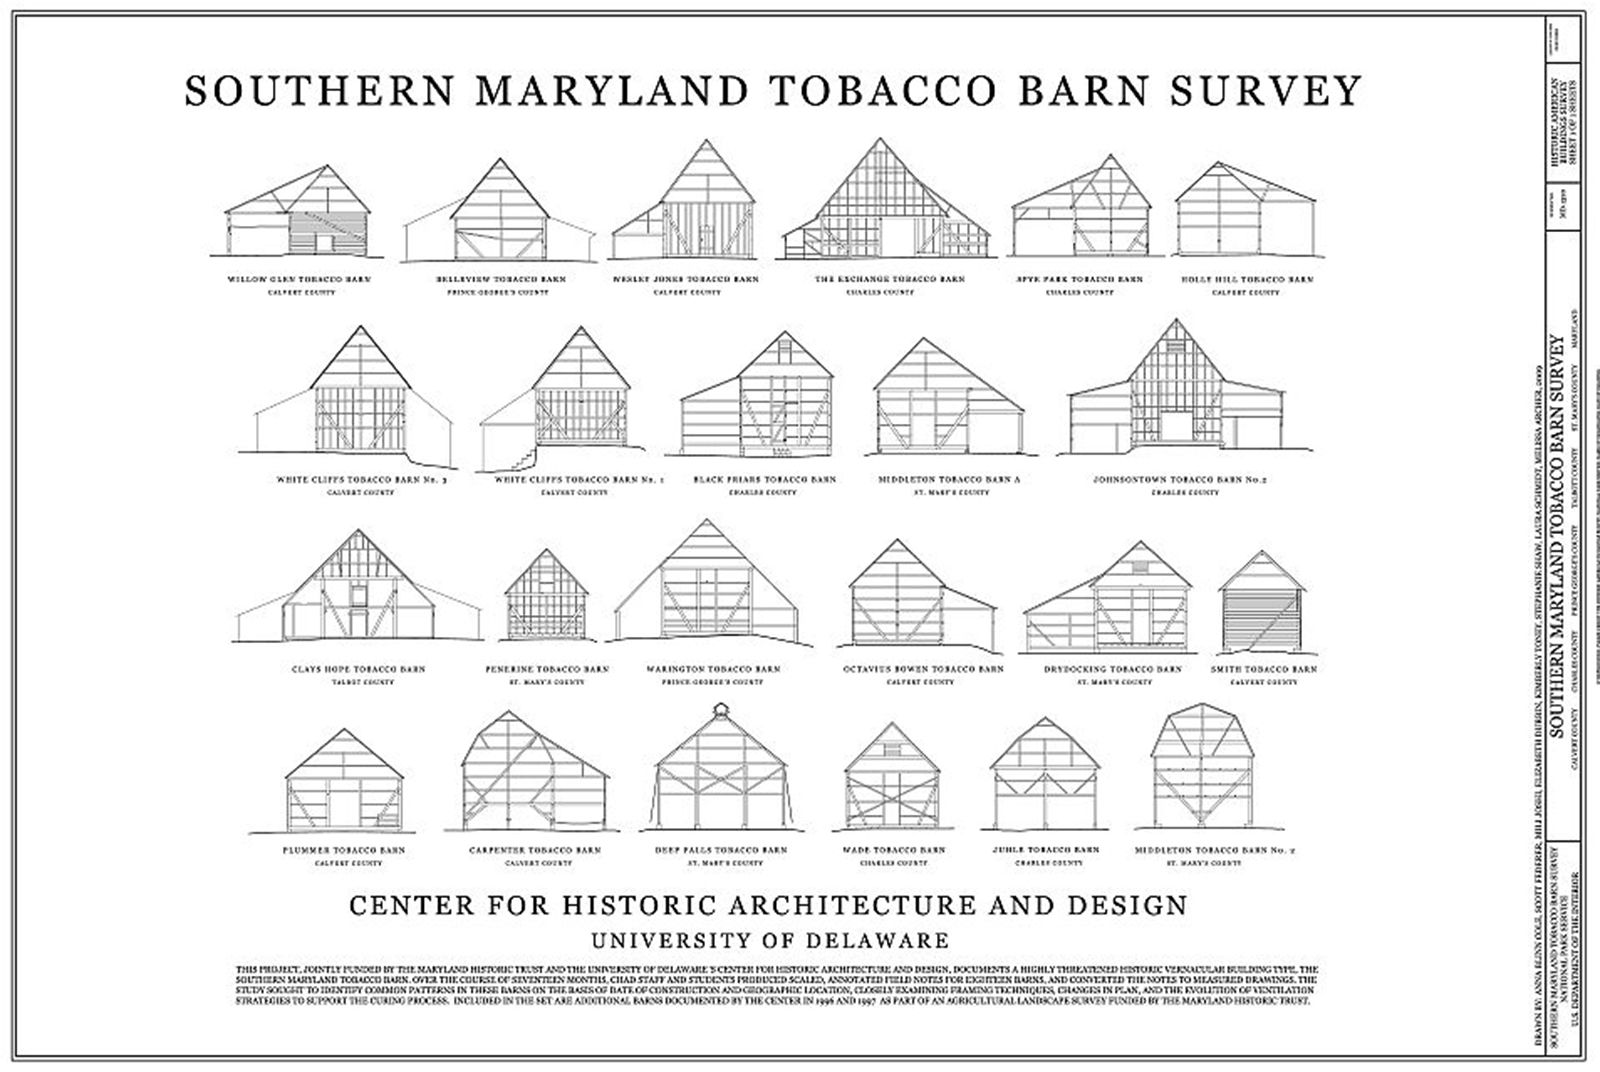 Maryland tobacco barn survey historical architecture